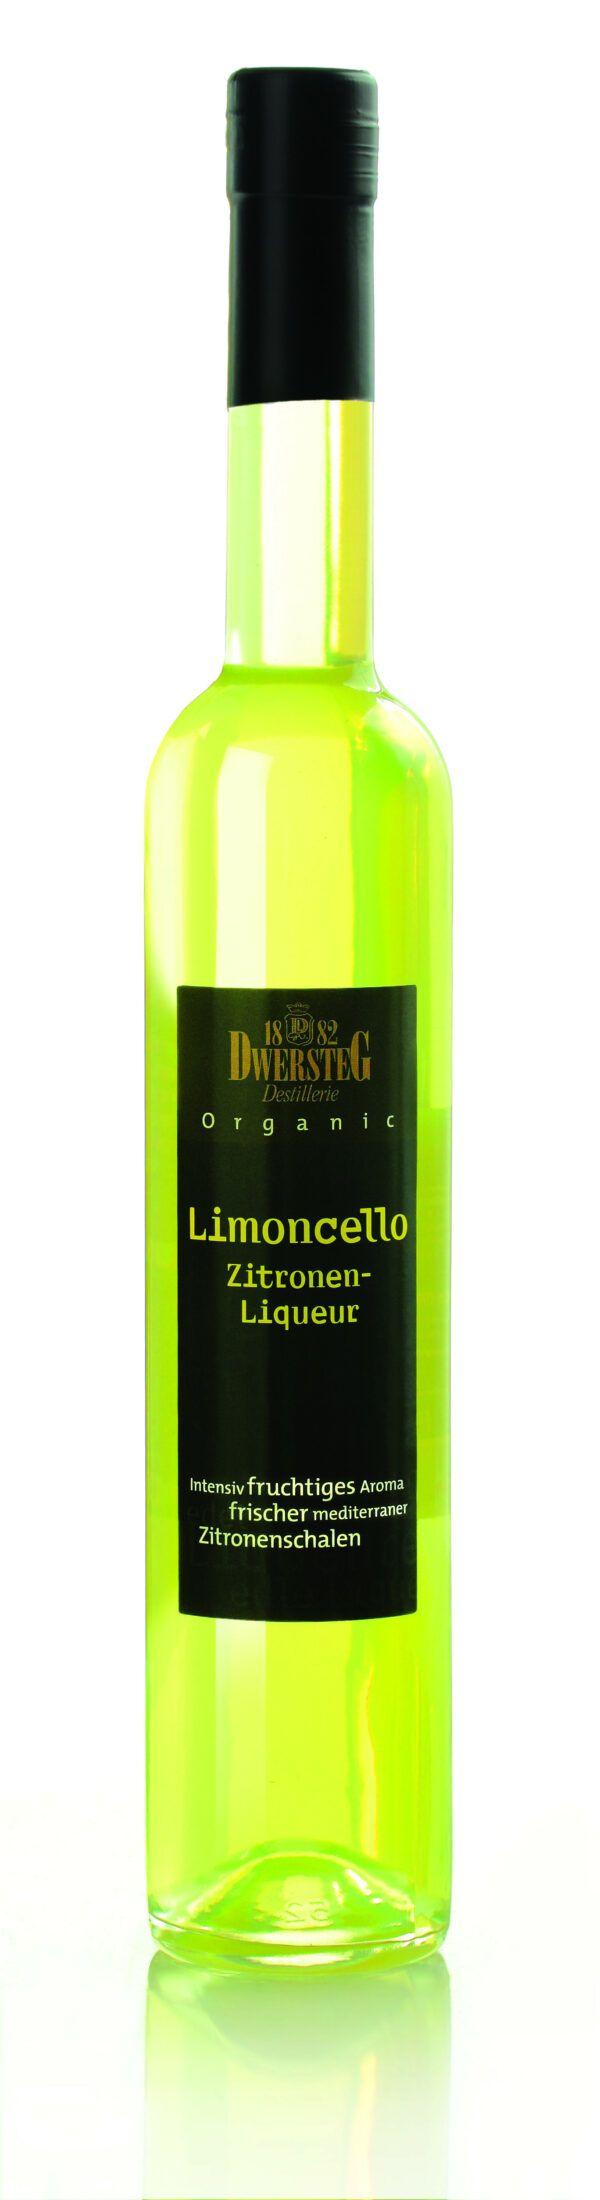 Dwersteg Organic Limoncello Zitronen Liqueur 0,5l